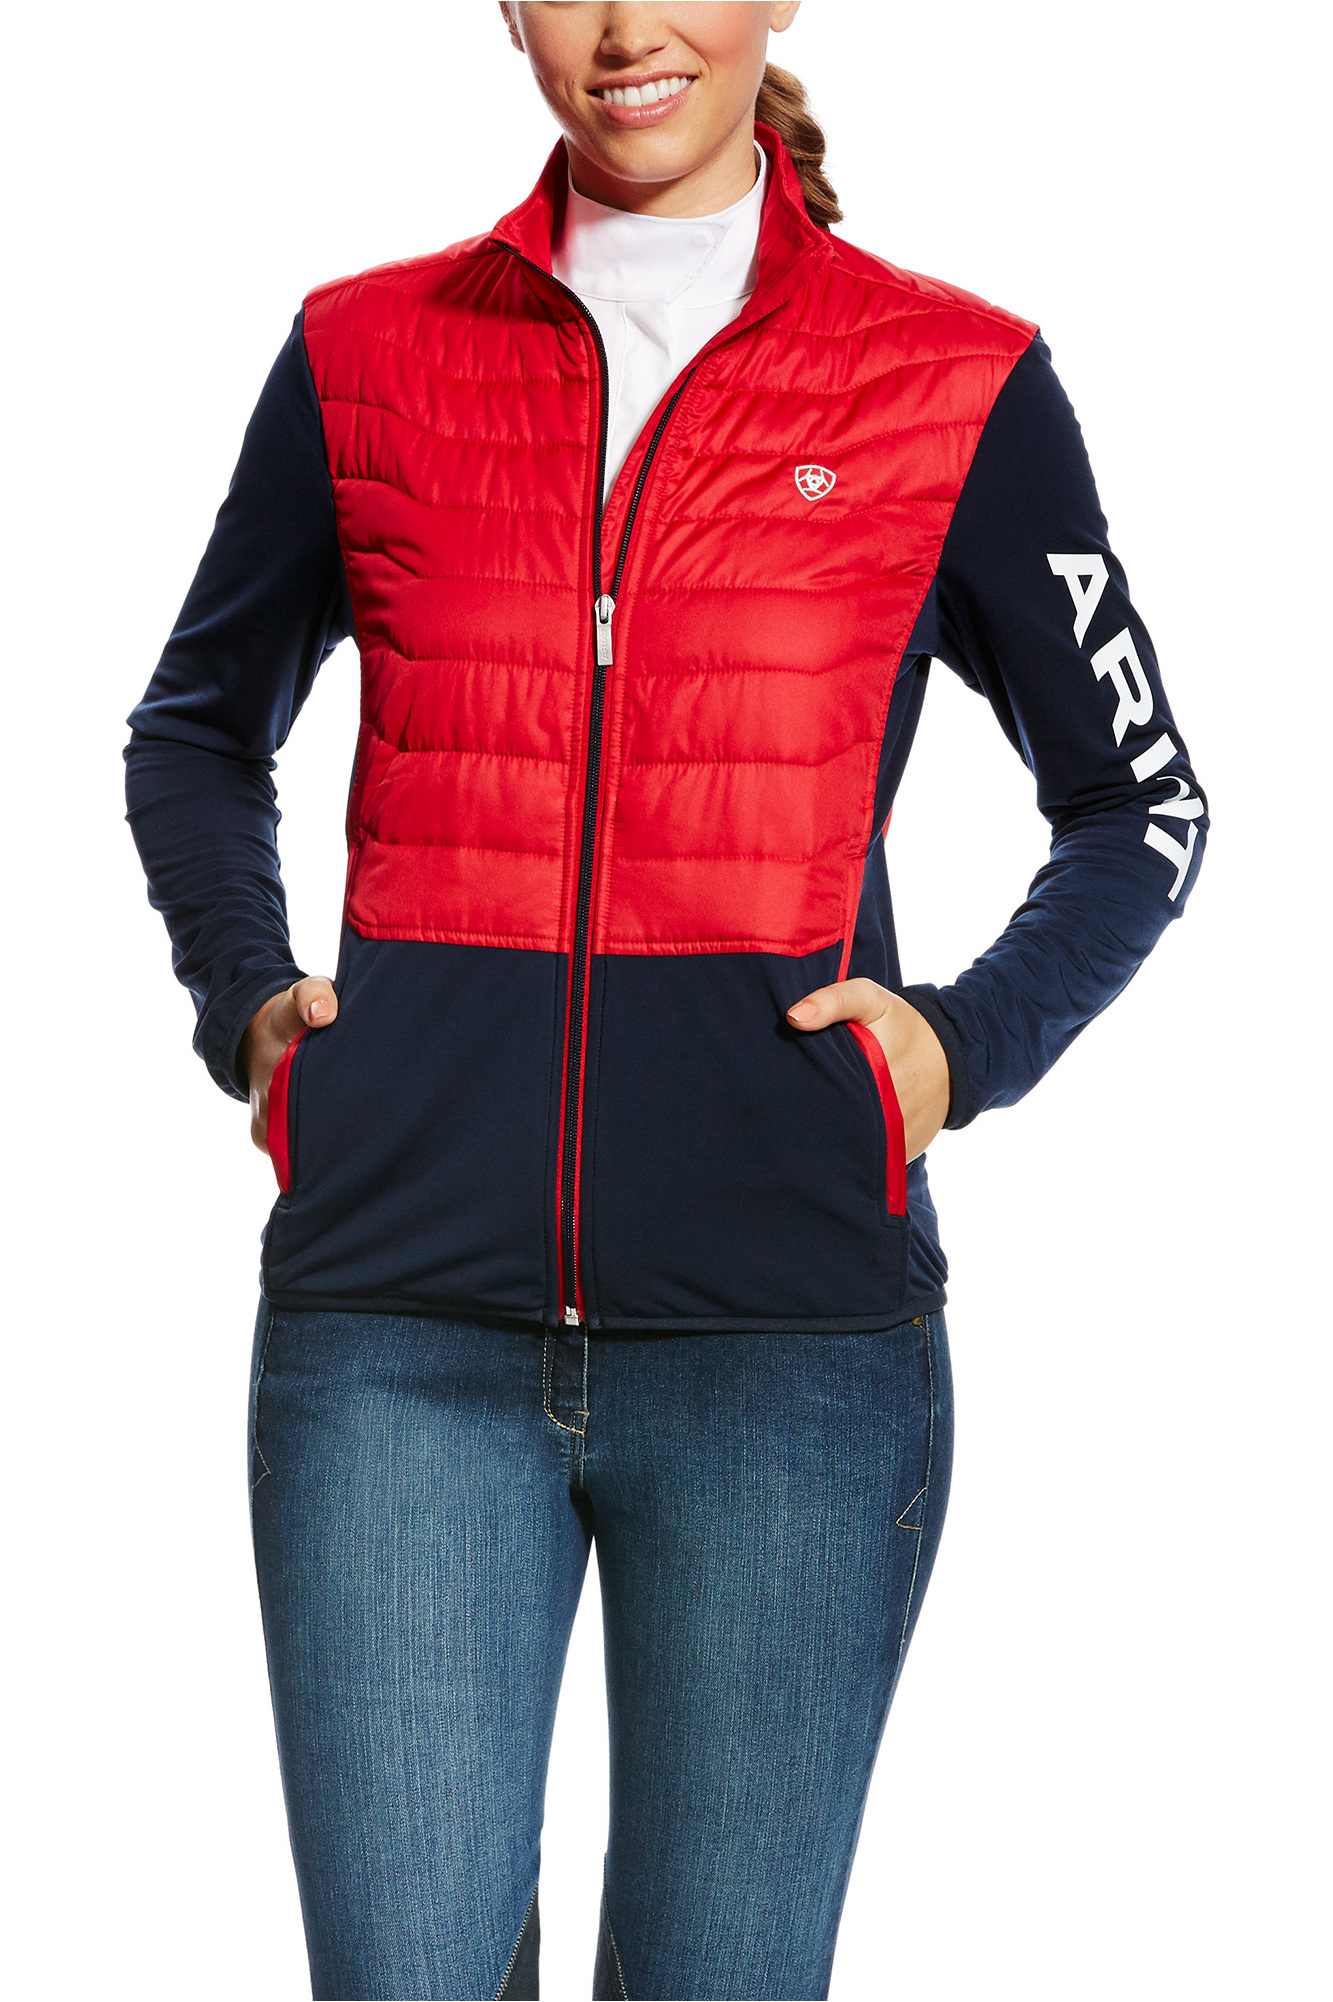 df3b2b9a795 Ariat Womens Capistrano Team Jacket Navy   Red ...